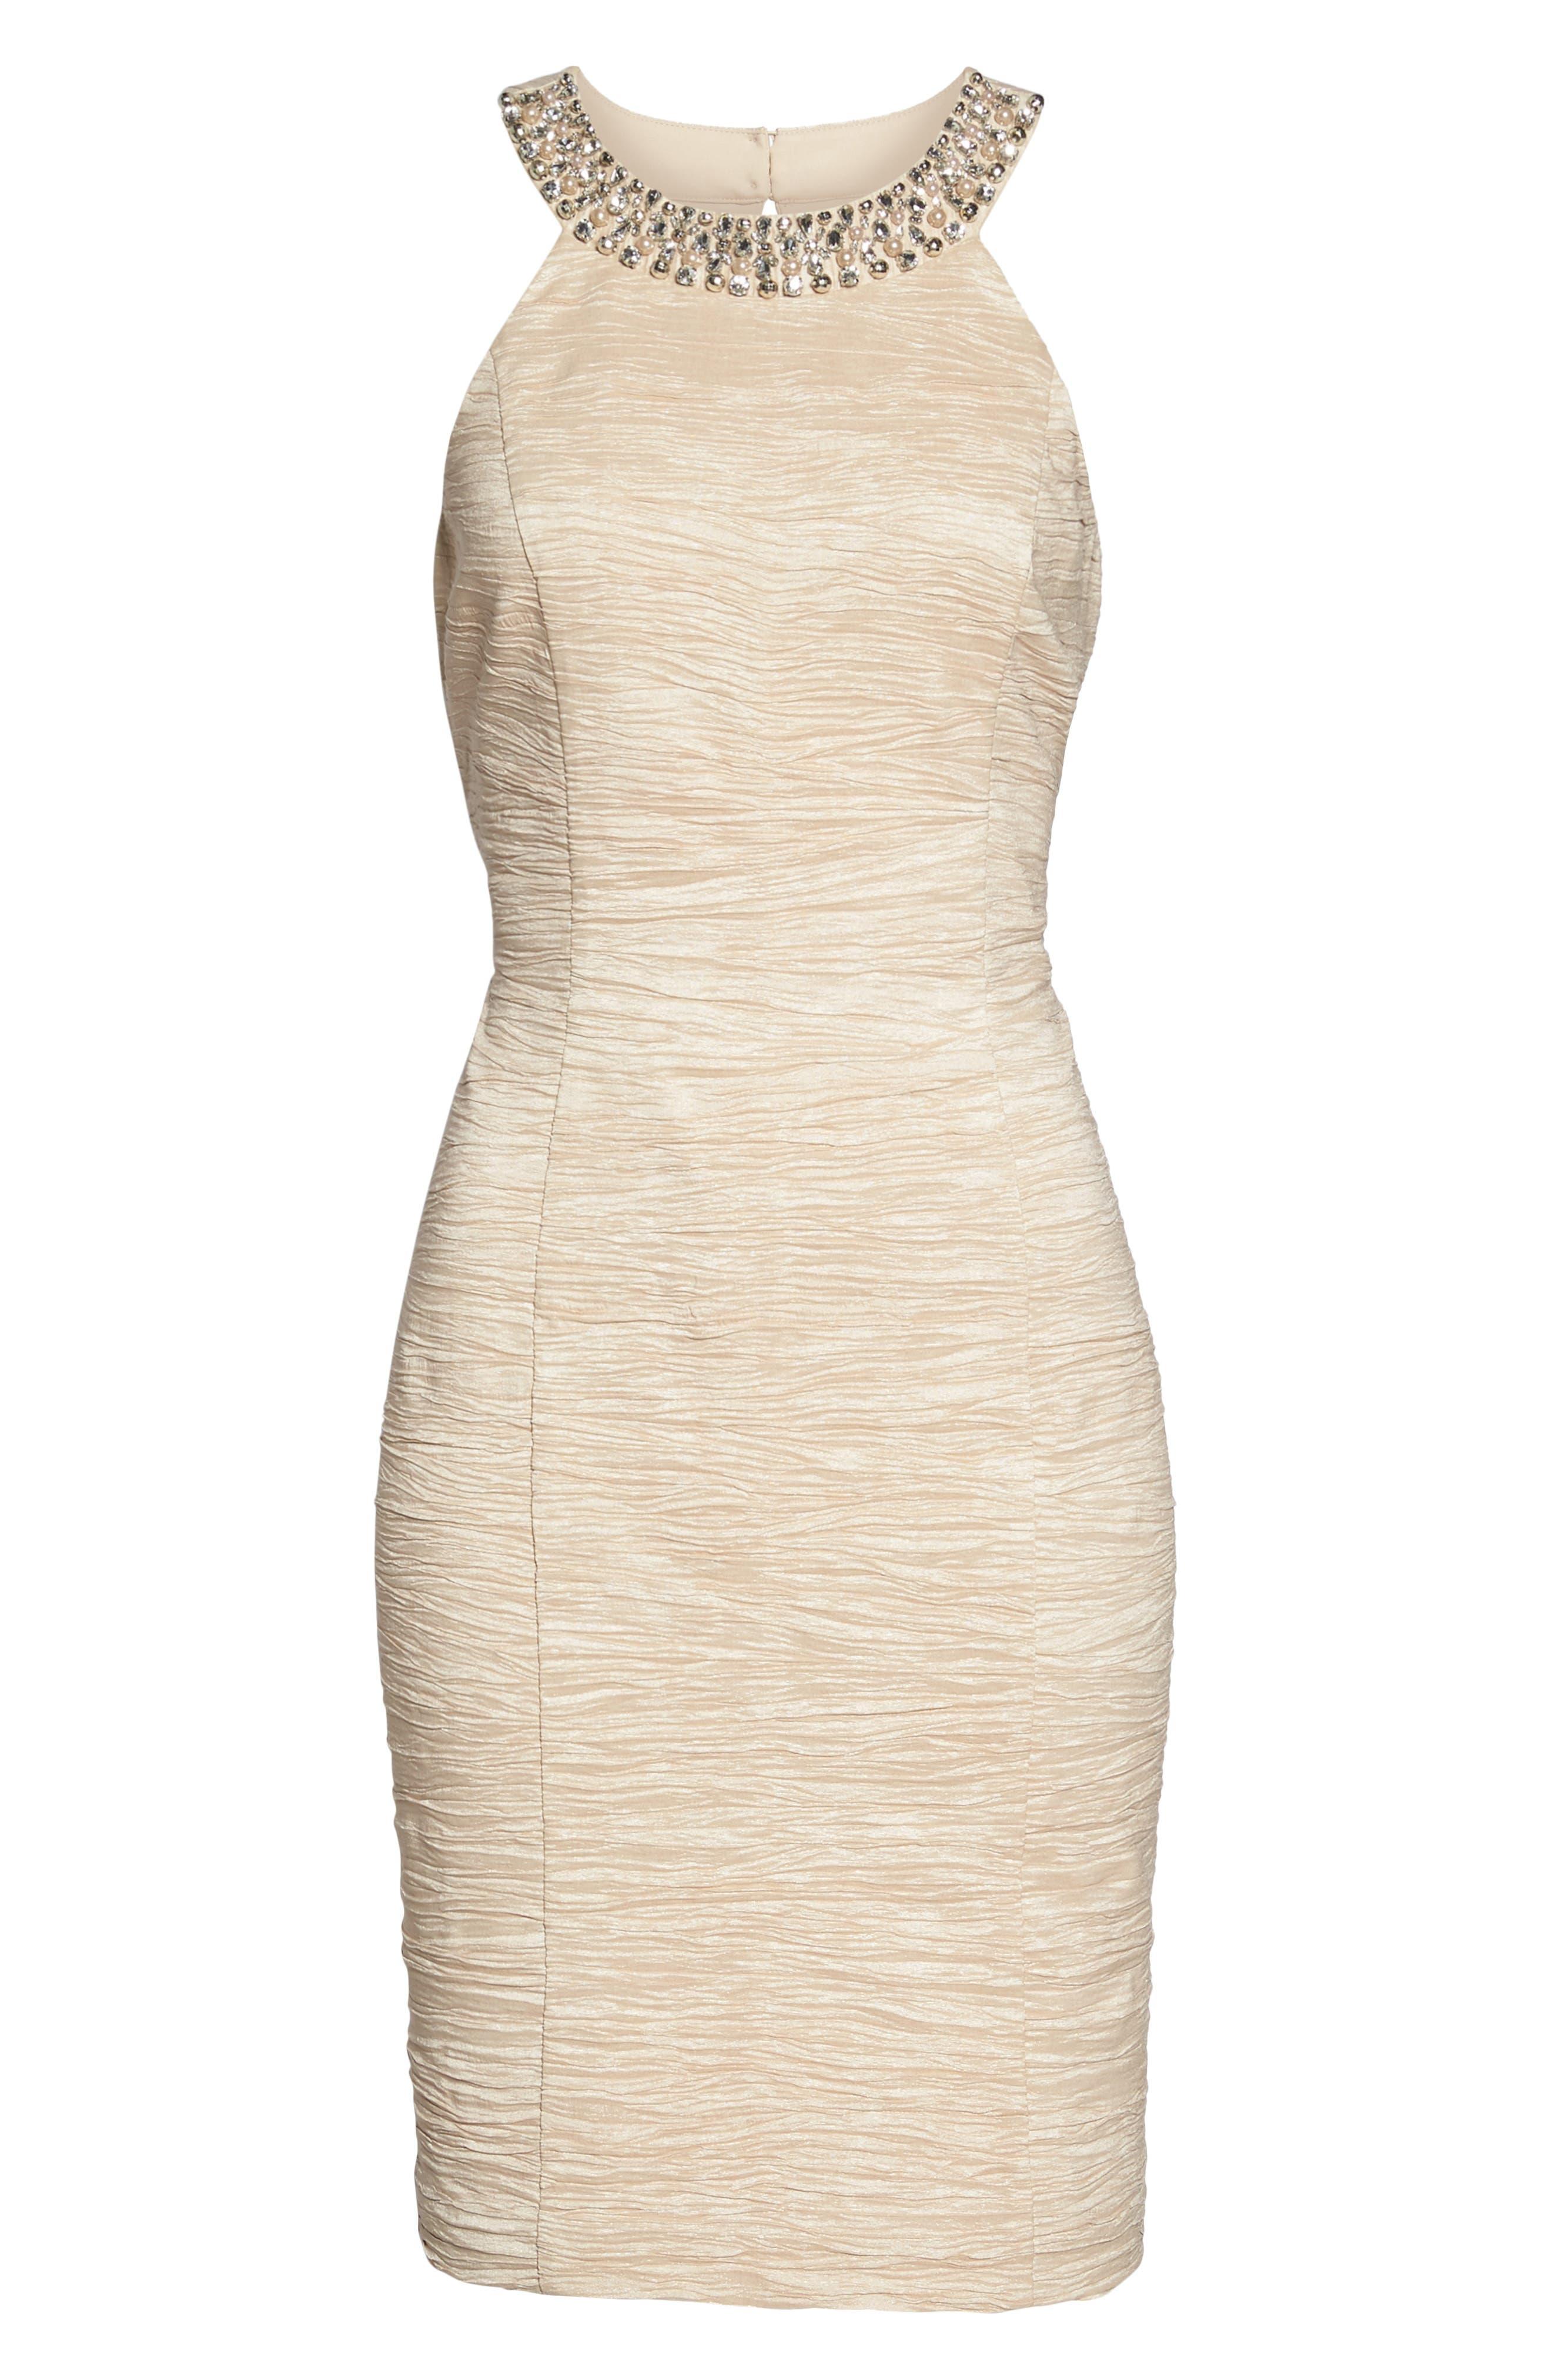 Embellished Crushed Taffeta Sheath Dress,                             Alternate thumbnail 6, color,